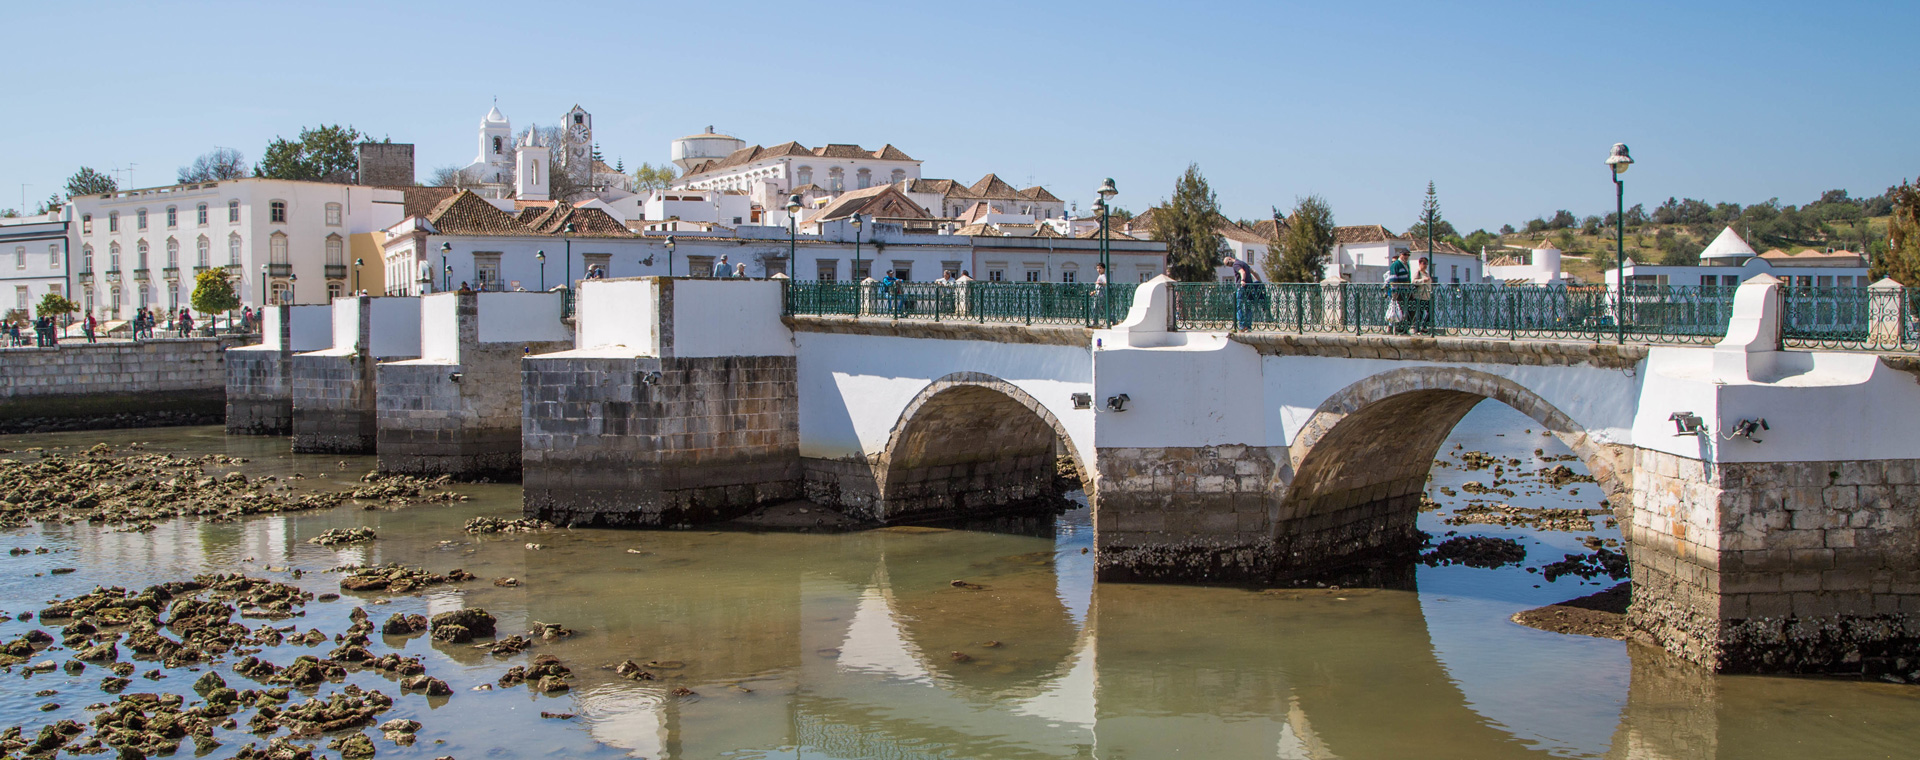 Image Break en Algarve